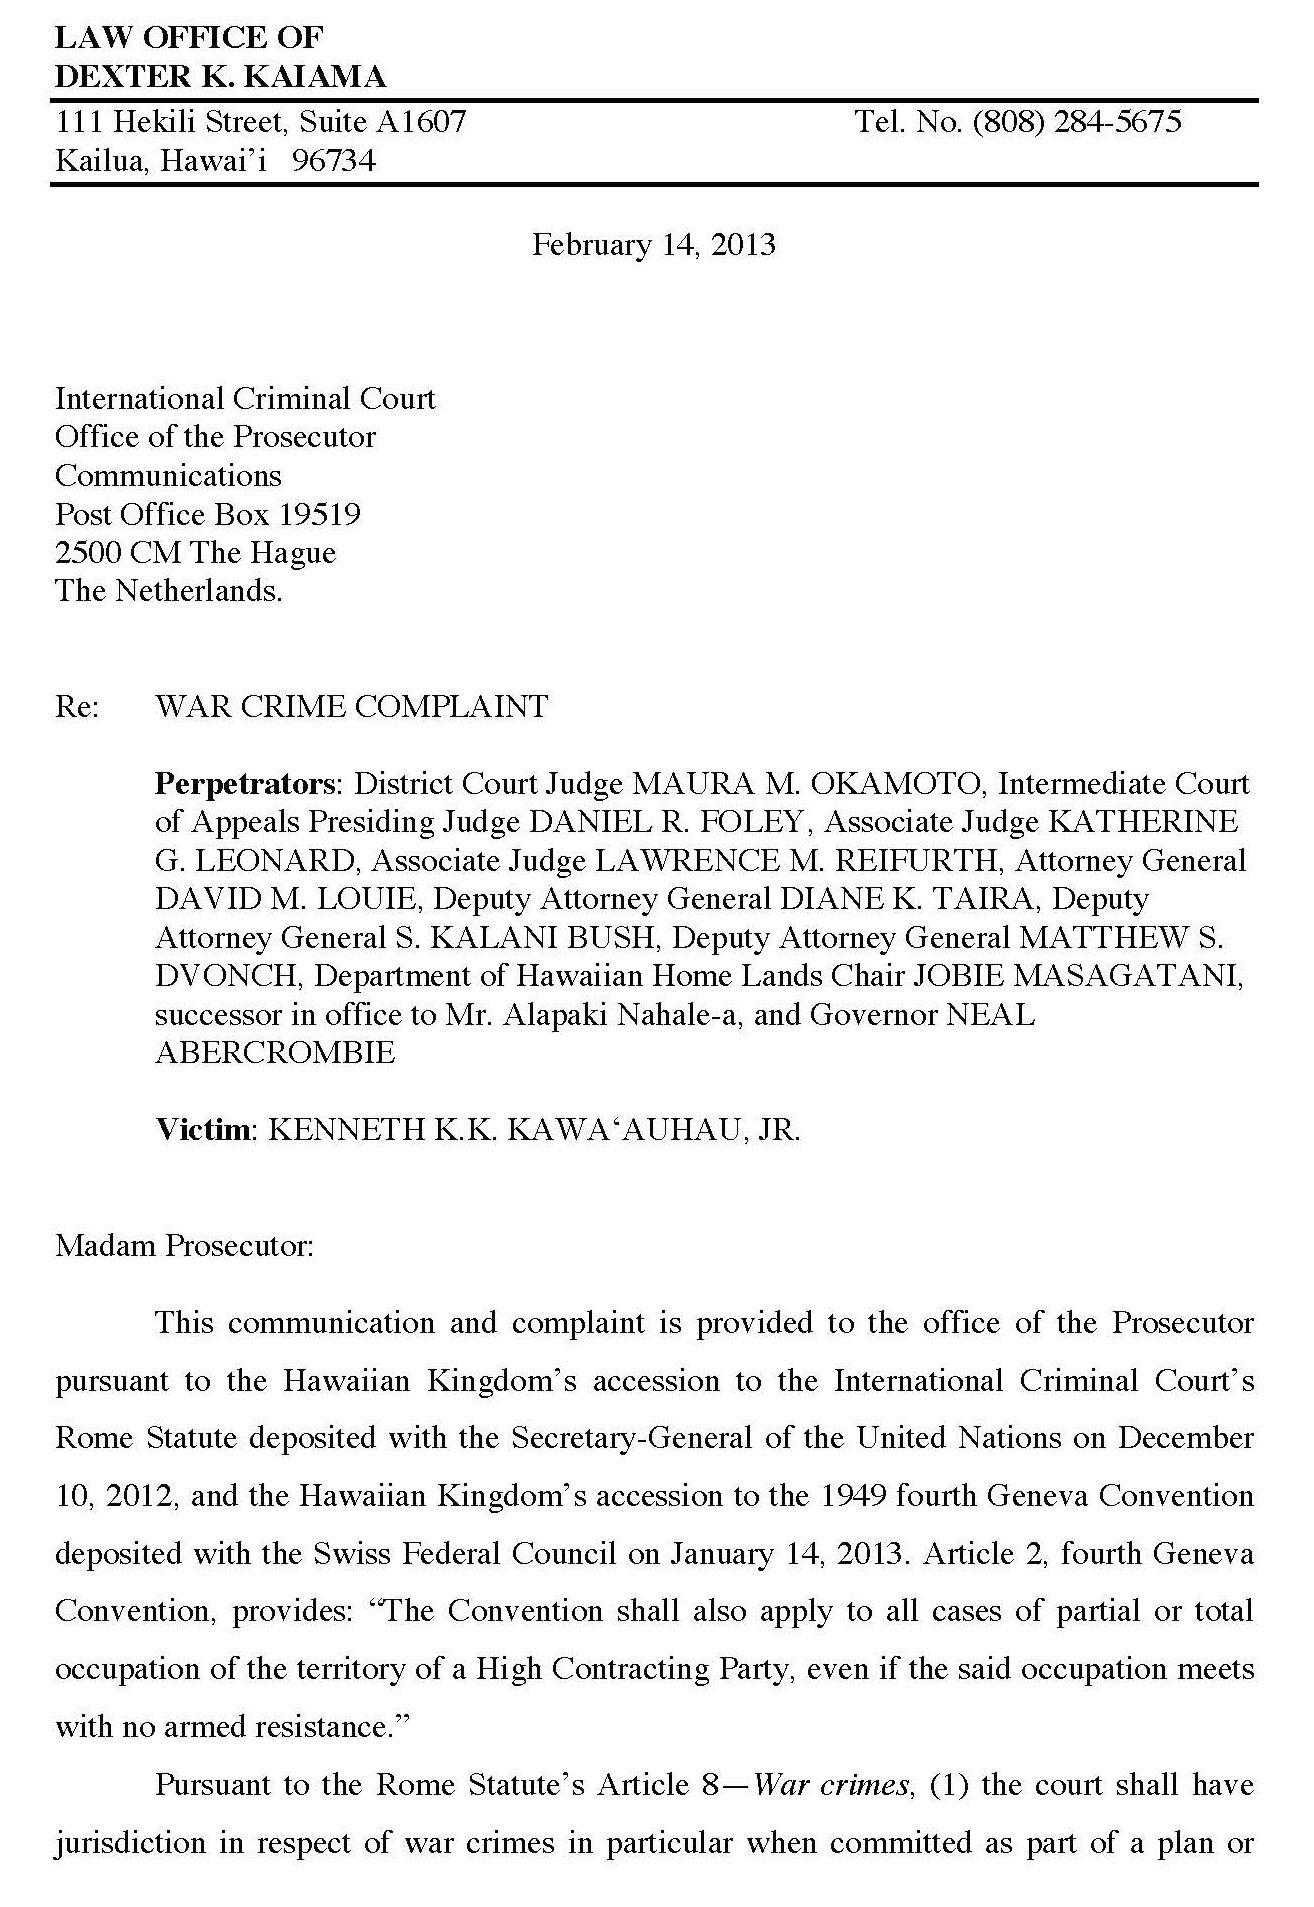 First War Crime Complaint Filed With International Criminal Court